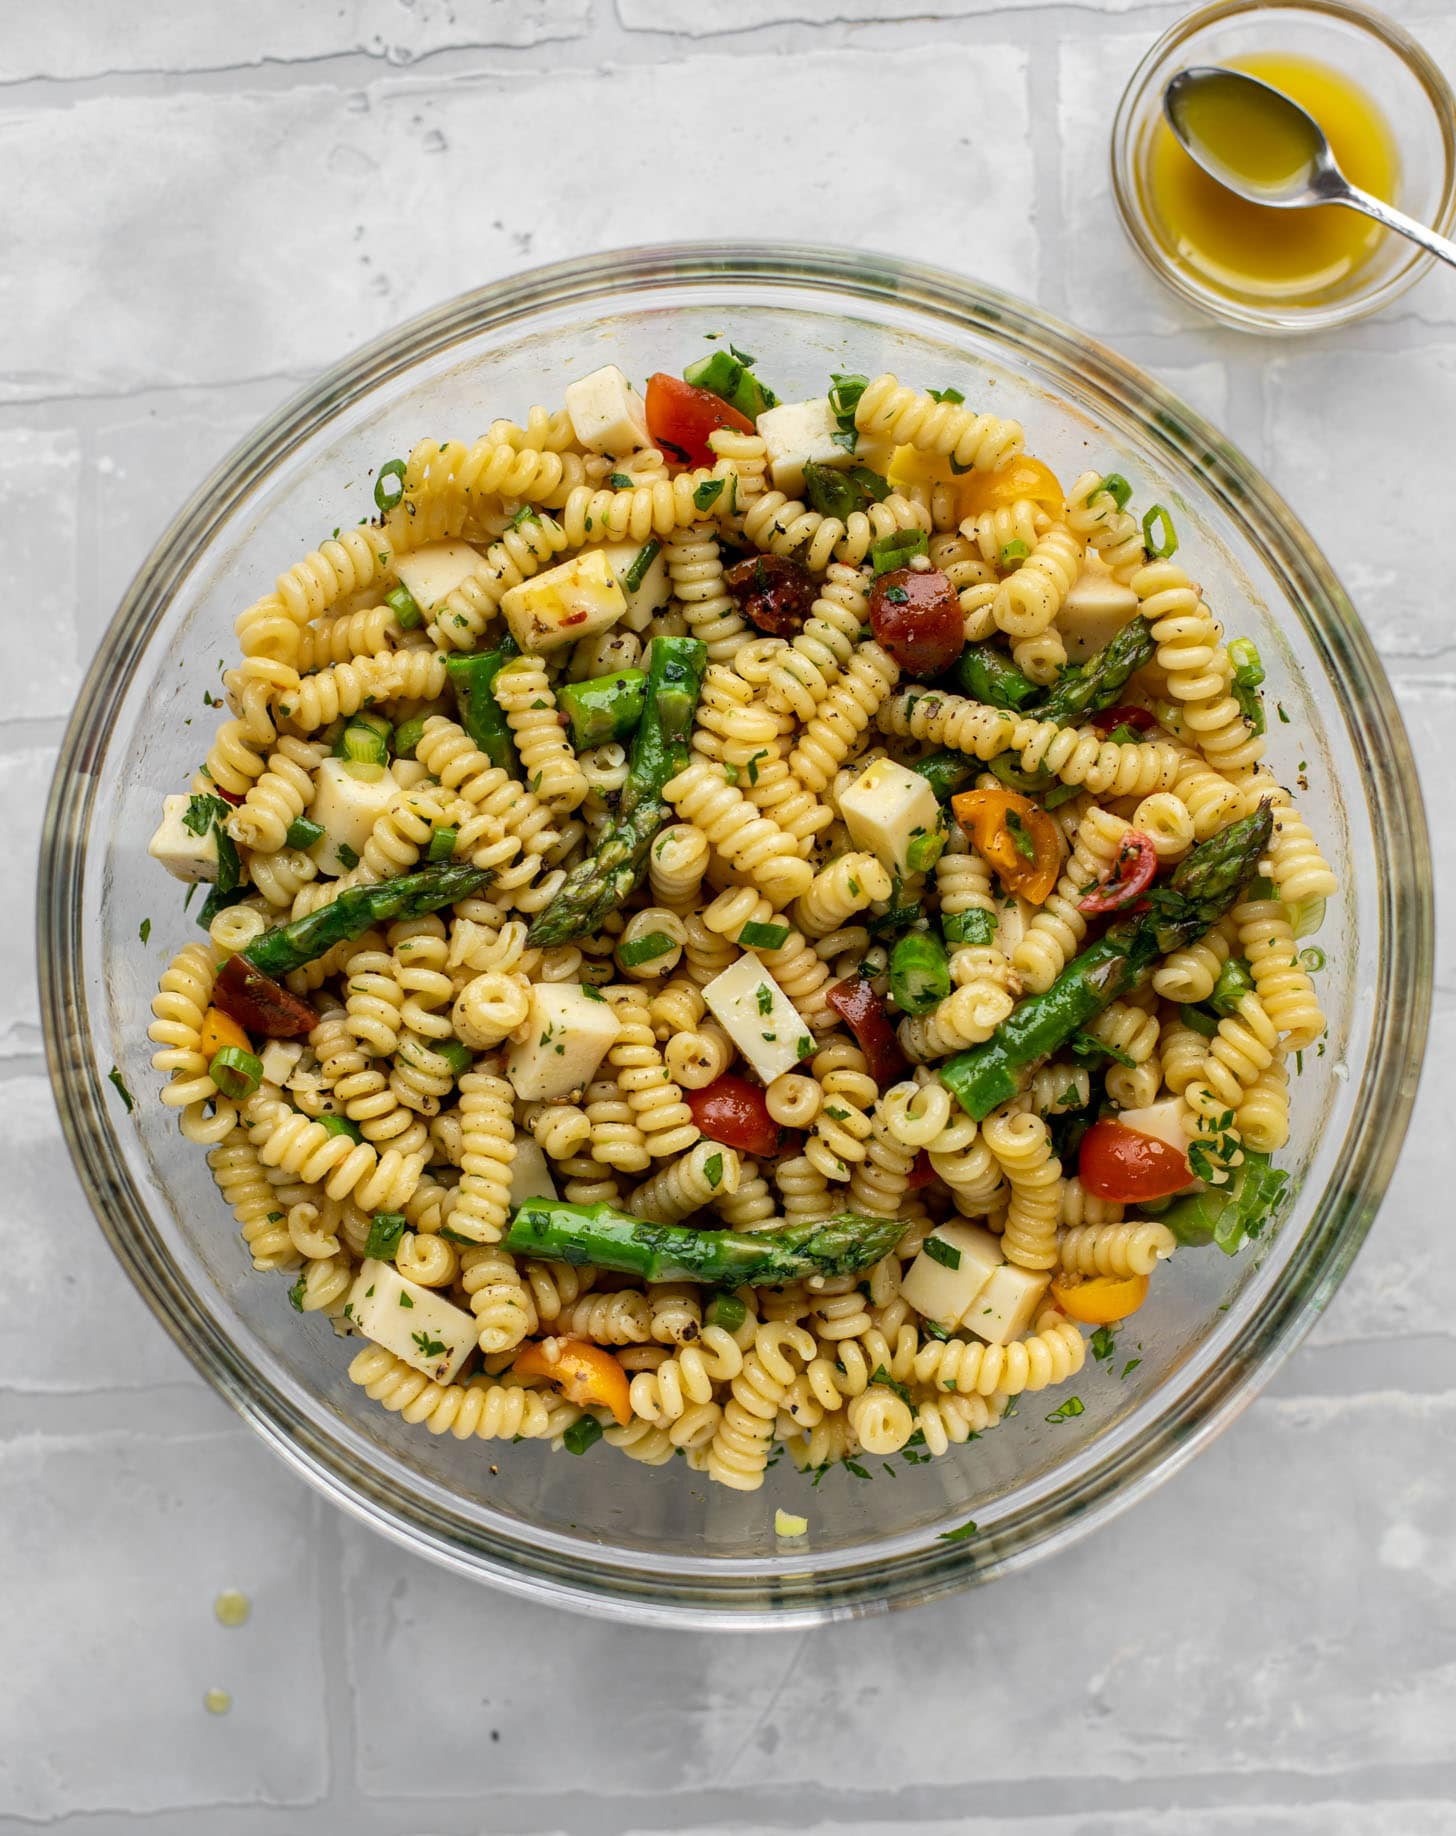 asparagus pasta salad with honey mustard dressing